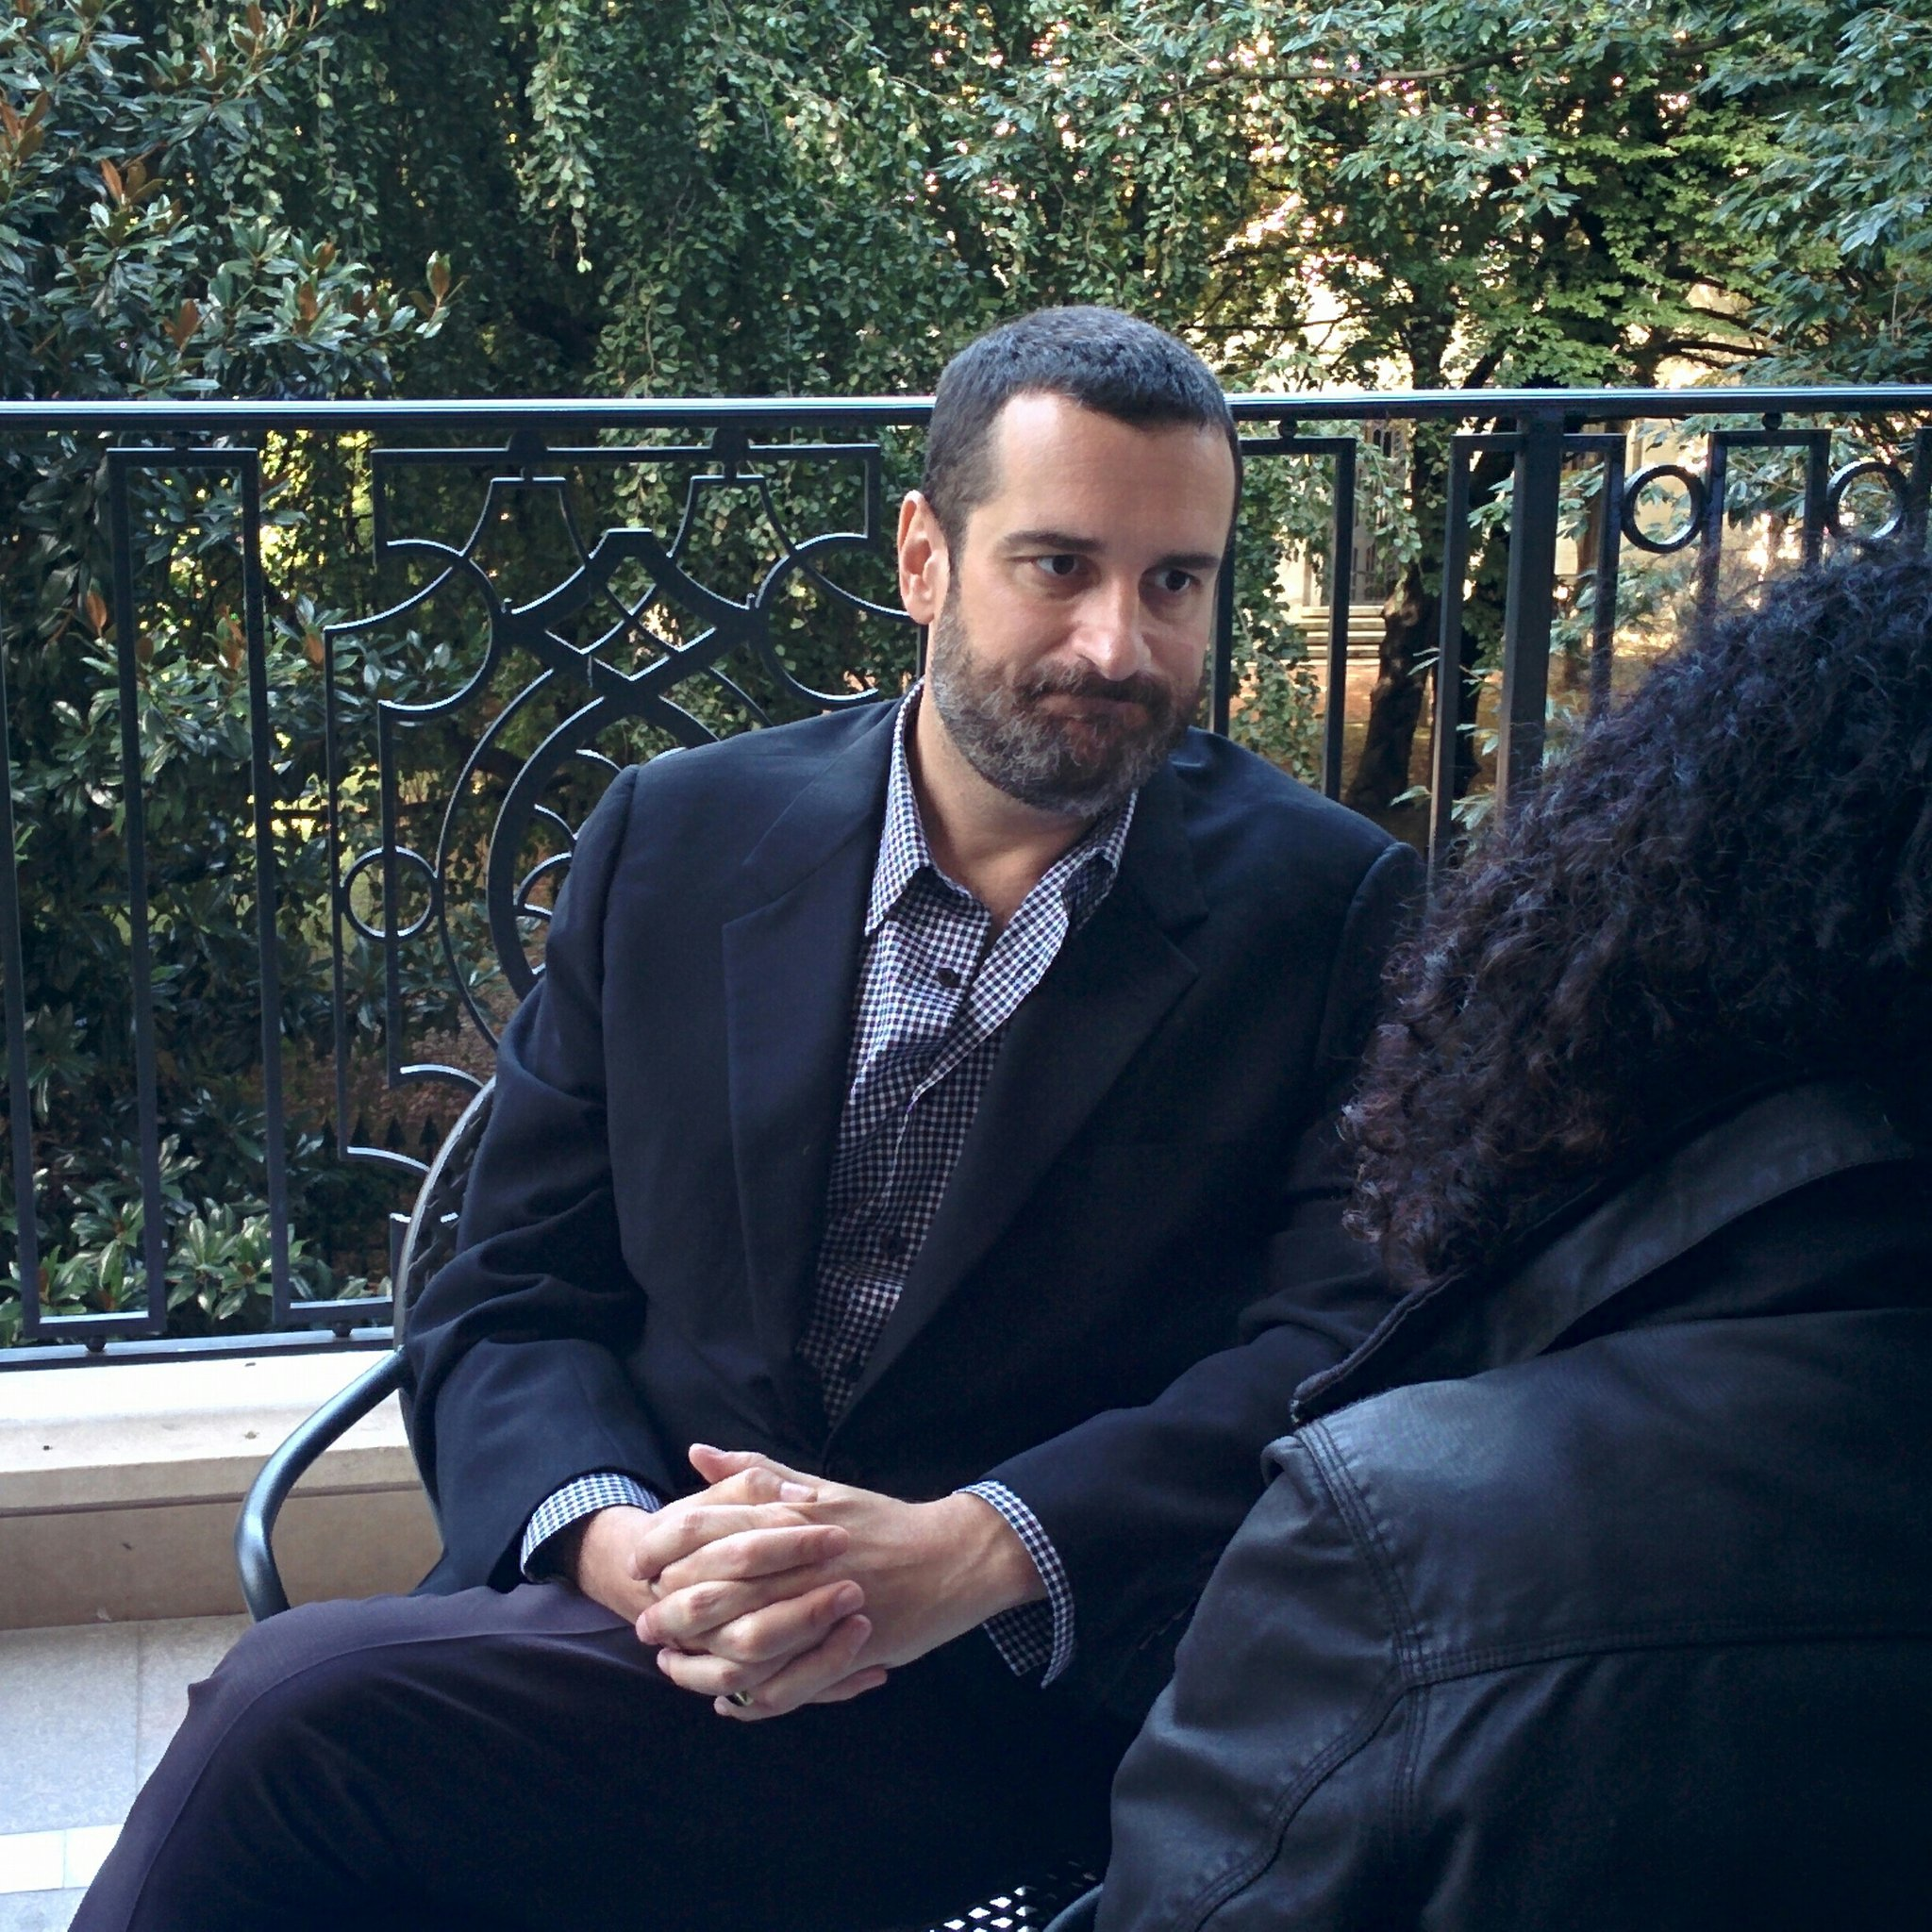 Momento interviste con @CdGherardesca �� #pechinoexpress https://t.co/j7BnRYK07H